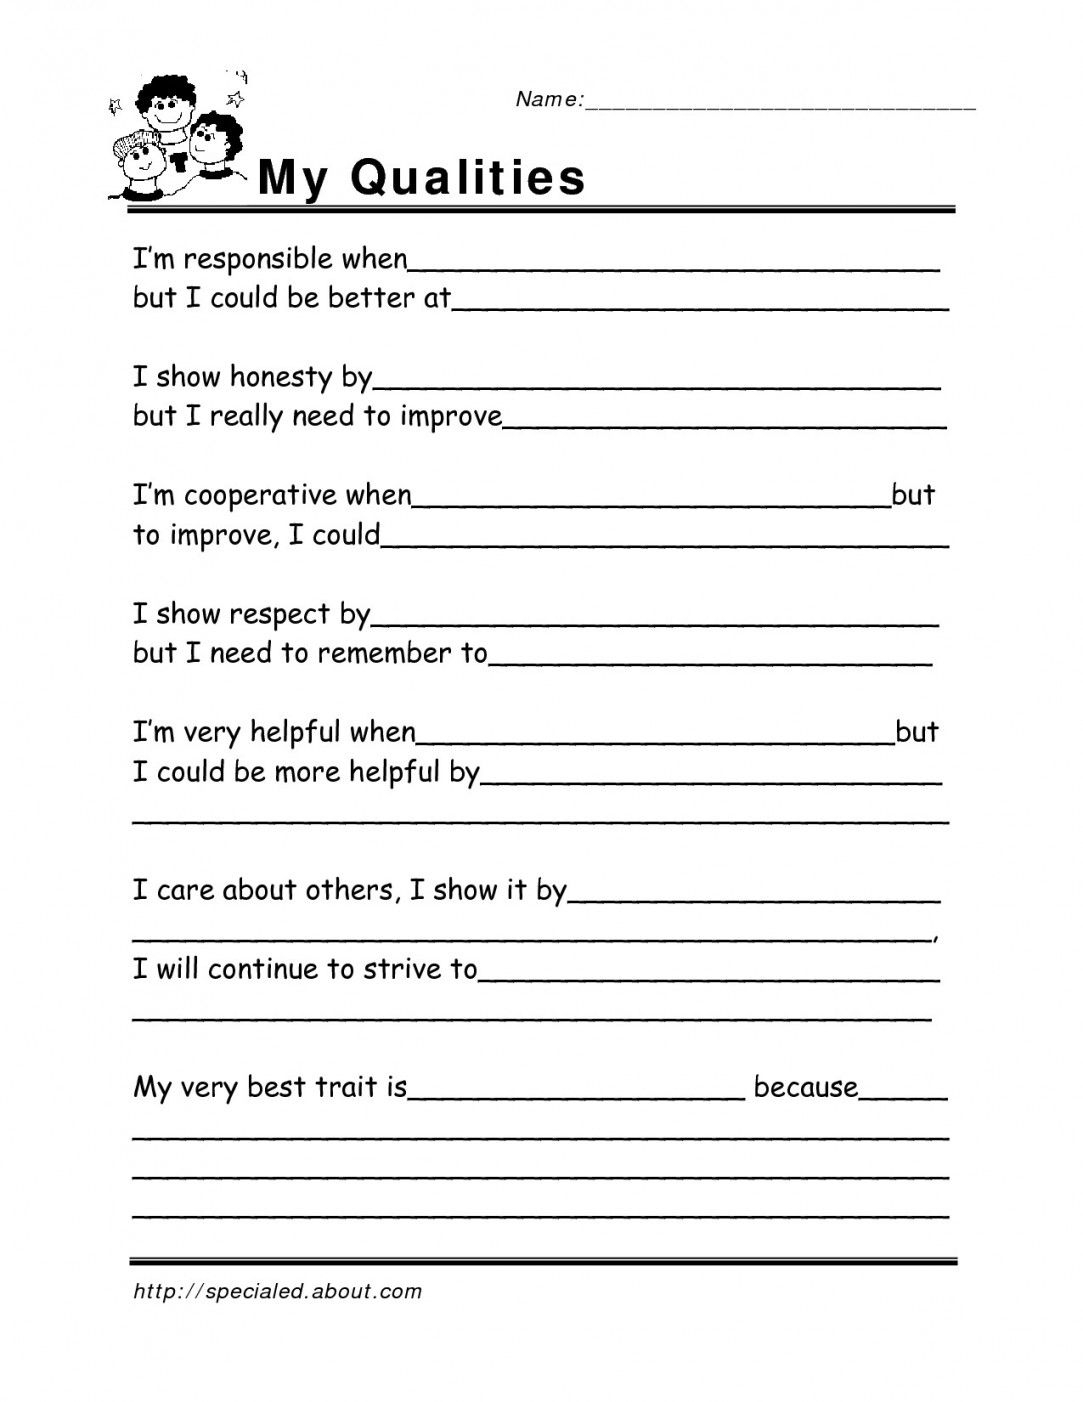 Free Printable Coping Skills Worksheets | Lostranquillos - Free Printable Coping Skills Worksheets